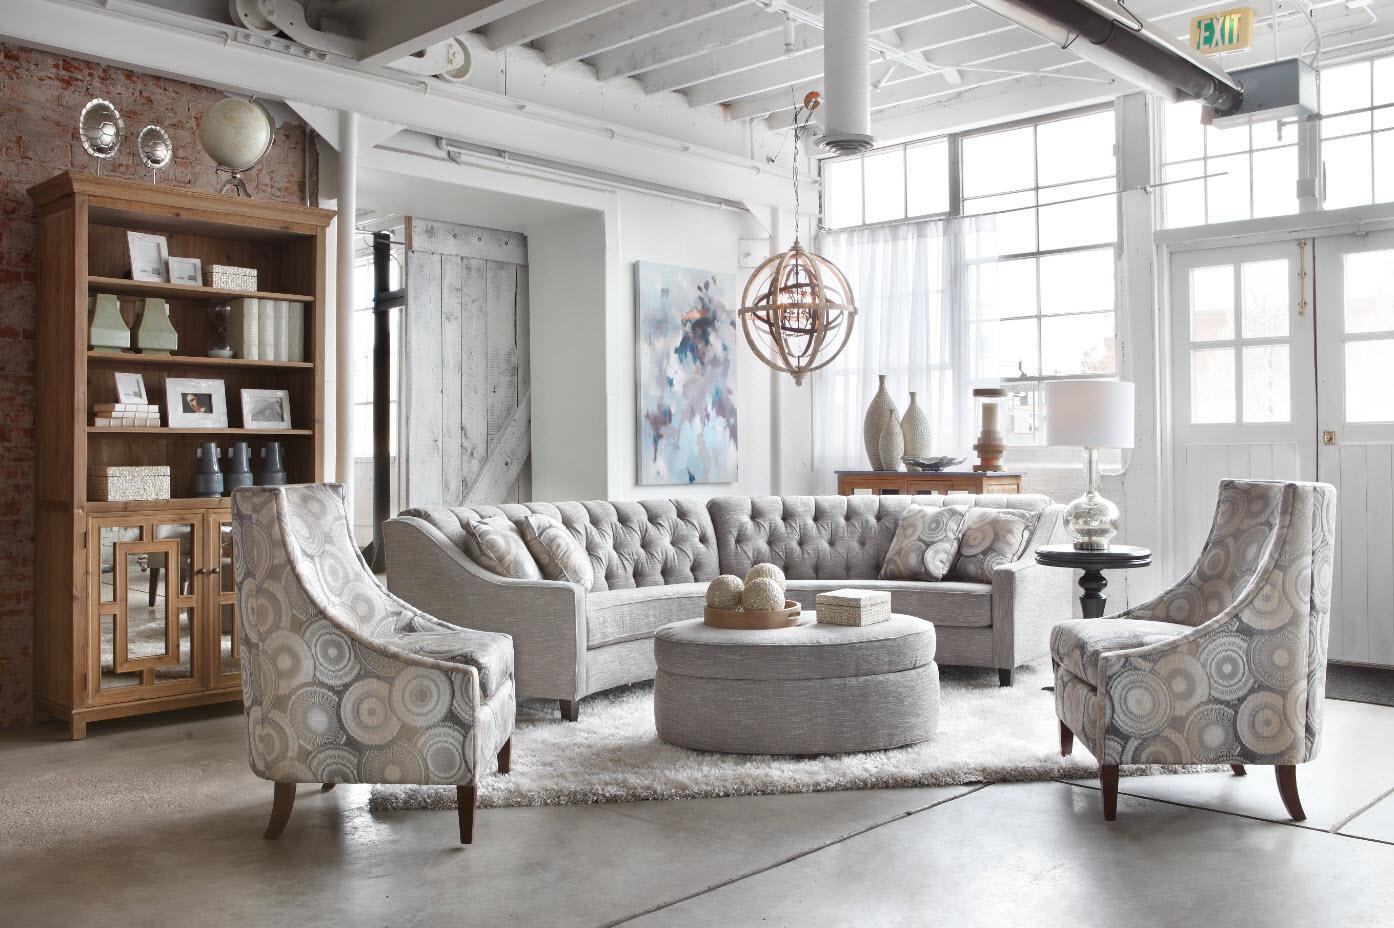 Furniture Row Brownsville Tx Www Furniturerow Com 956 350 8181